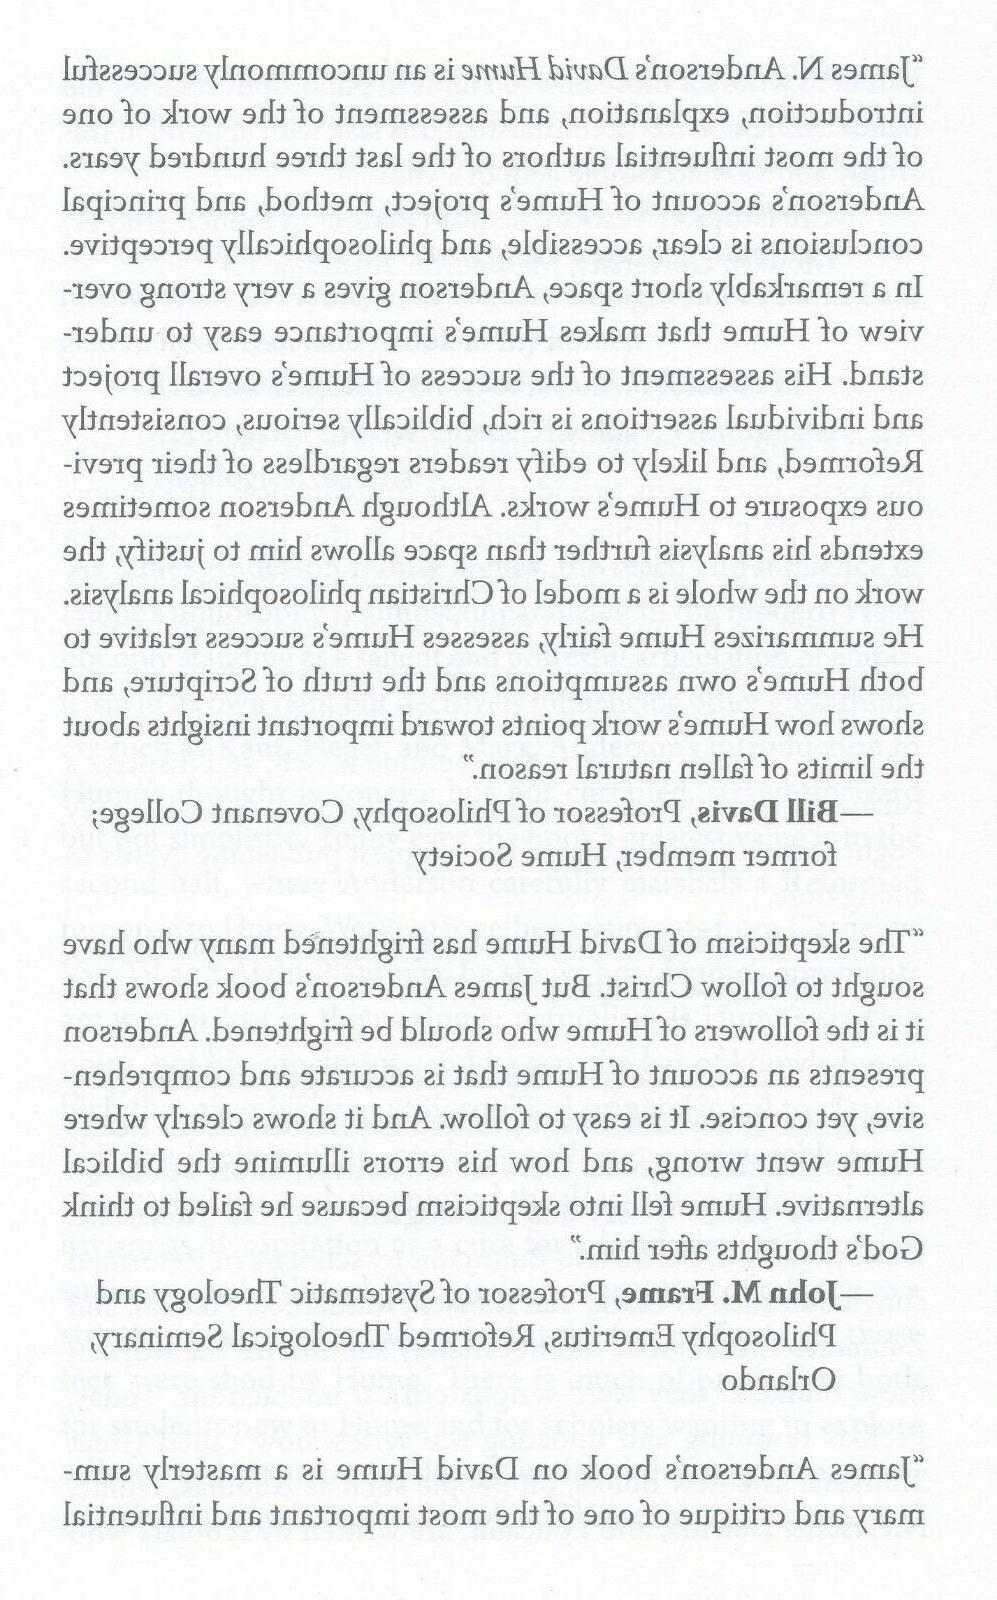 David Hume Anderson Publishing